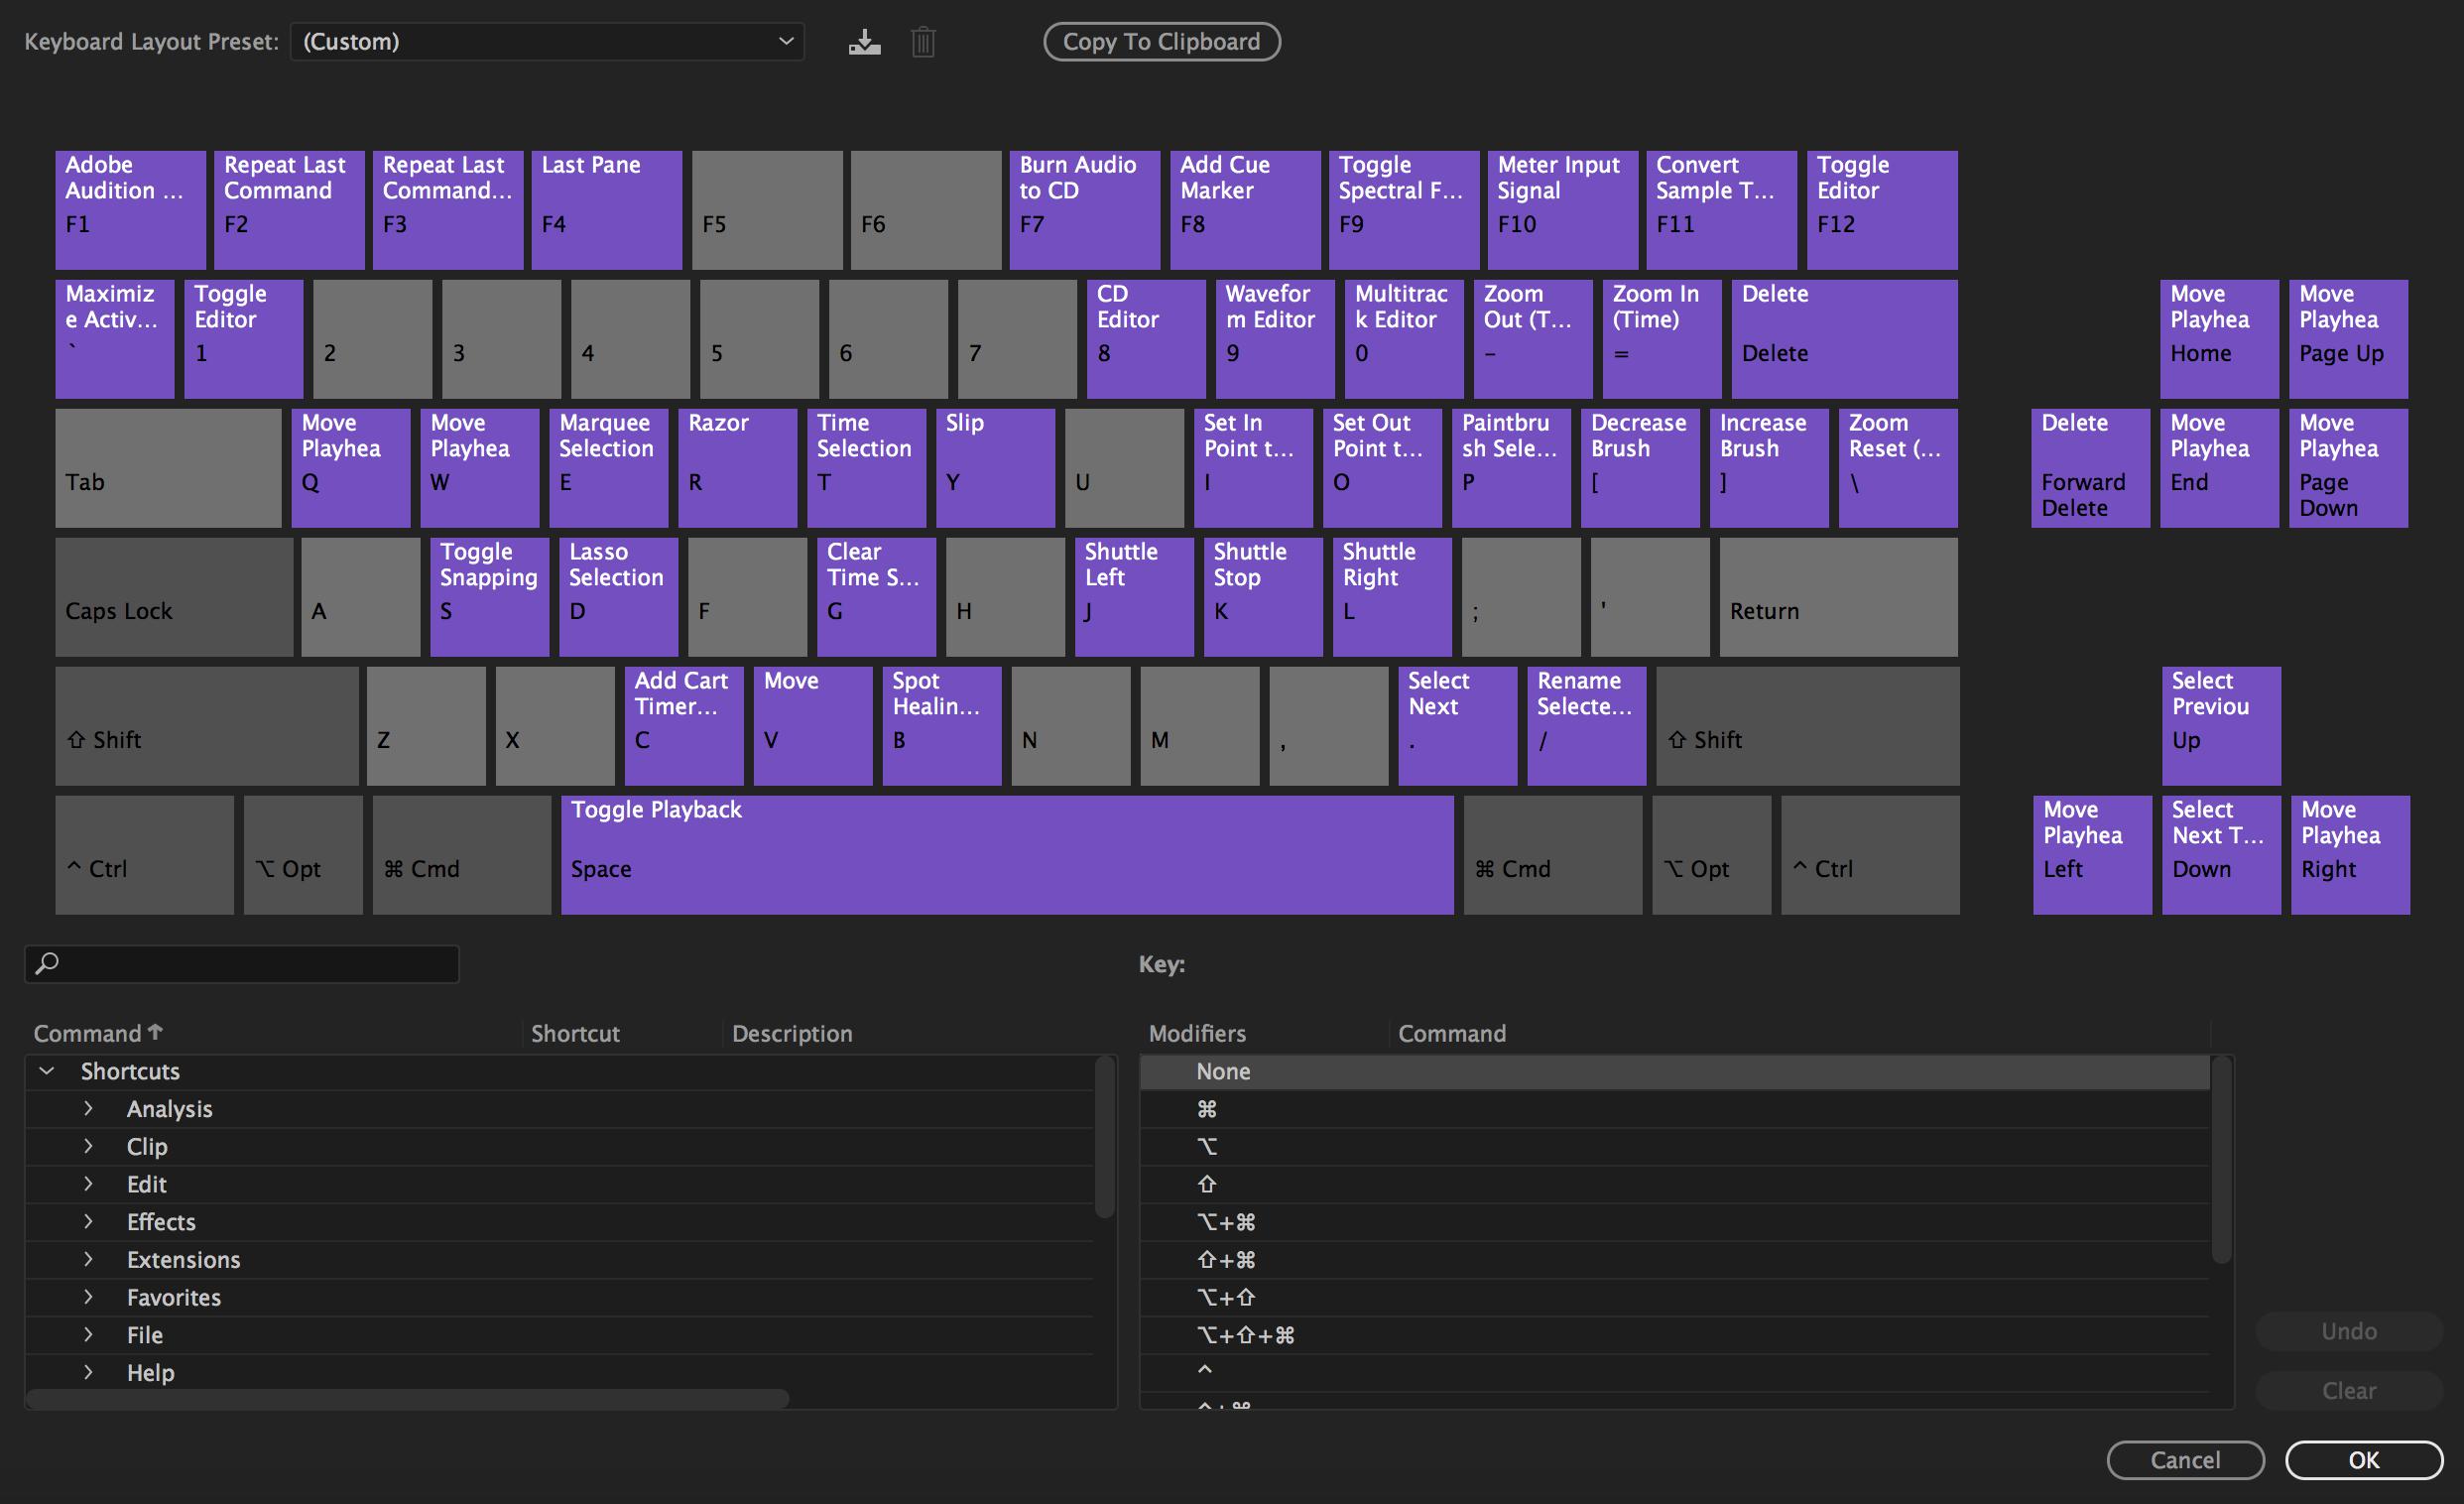 using the visual keyboard shortcuts and customizing shortcuts